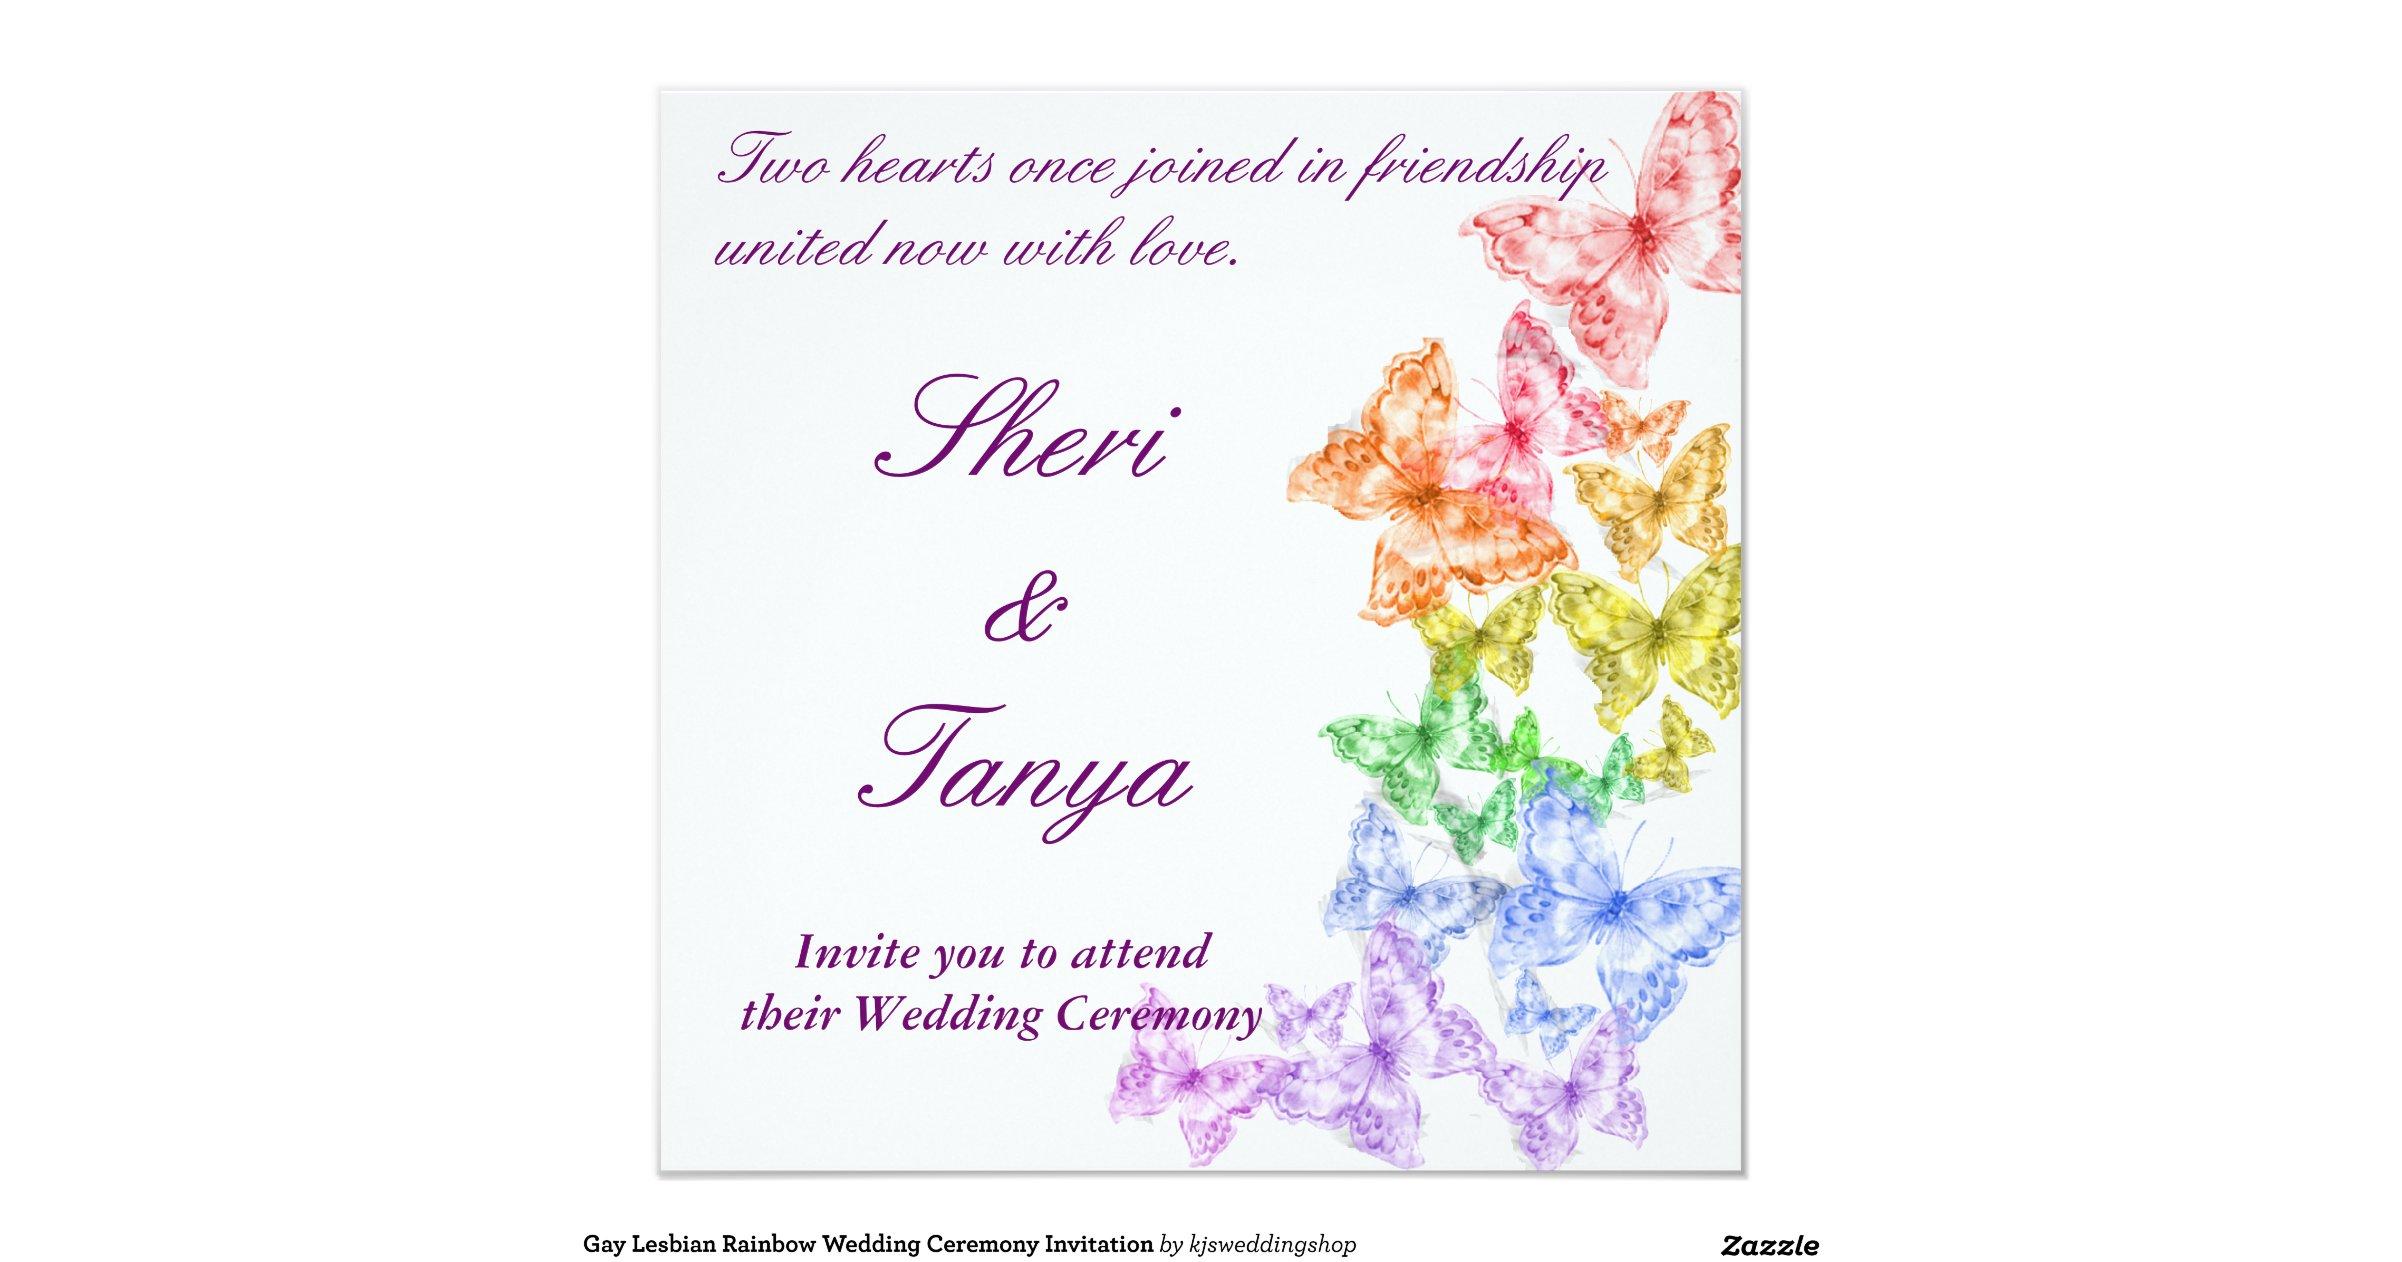 Gay Wedding Invite: Gay_lesbian_rainbow_wedding_ceremony_invitation